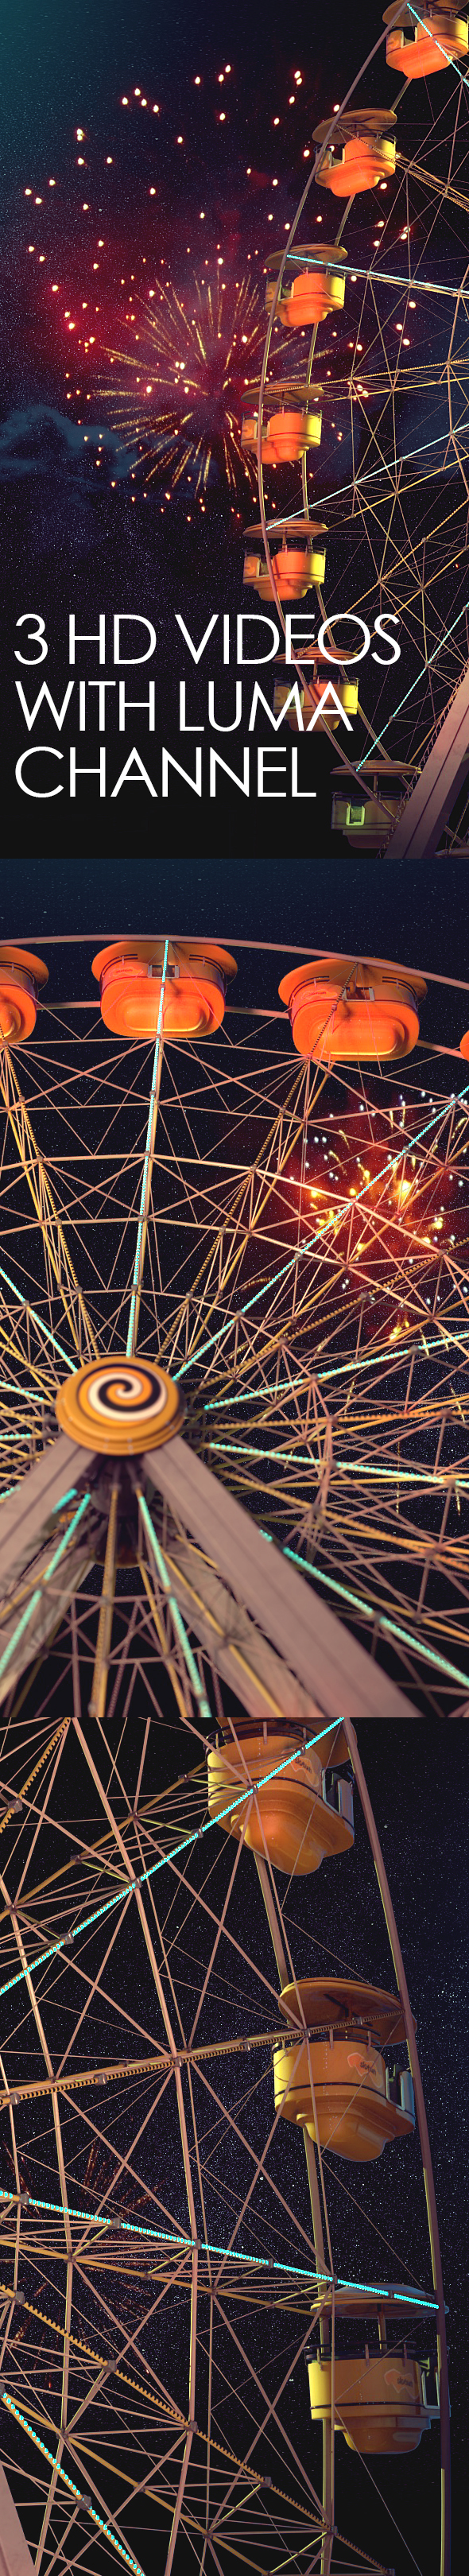 Ferris Wheel at Night - 1